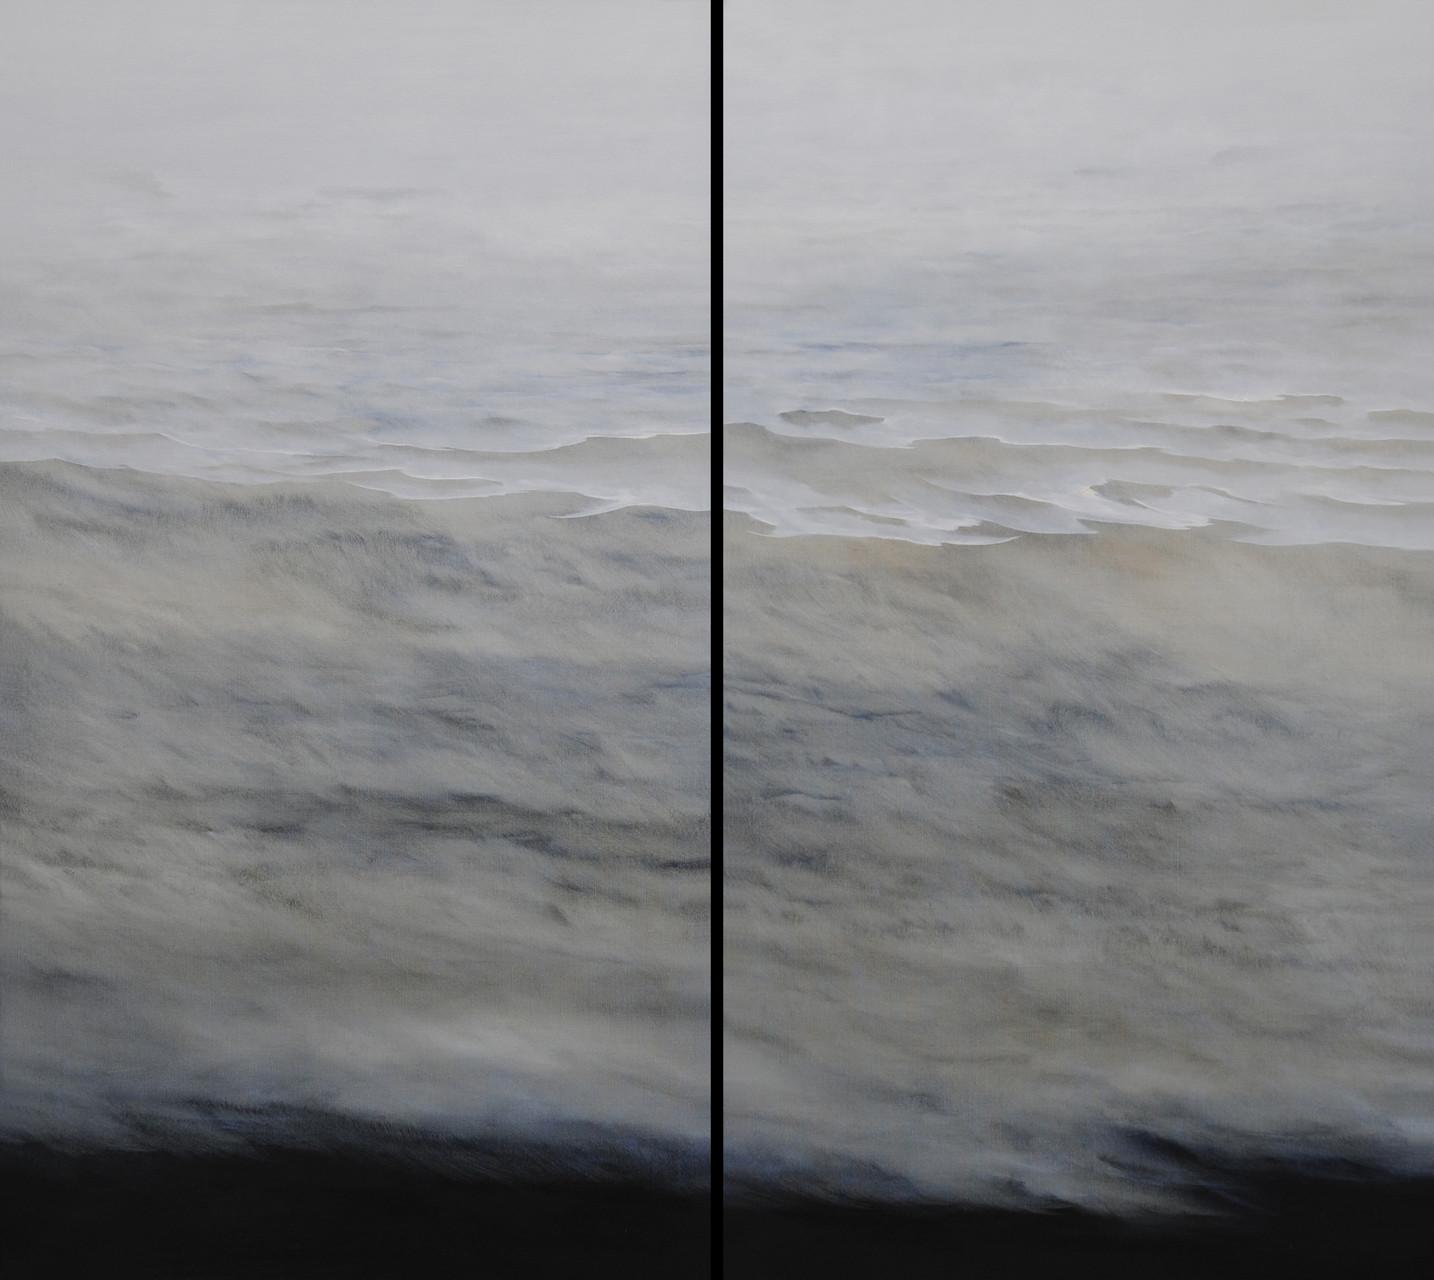 OHNE TITEL, Diptychon, 2011, Öl/Lwd., 2 x 100 x 180cm